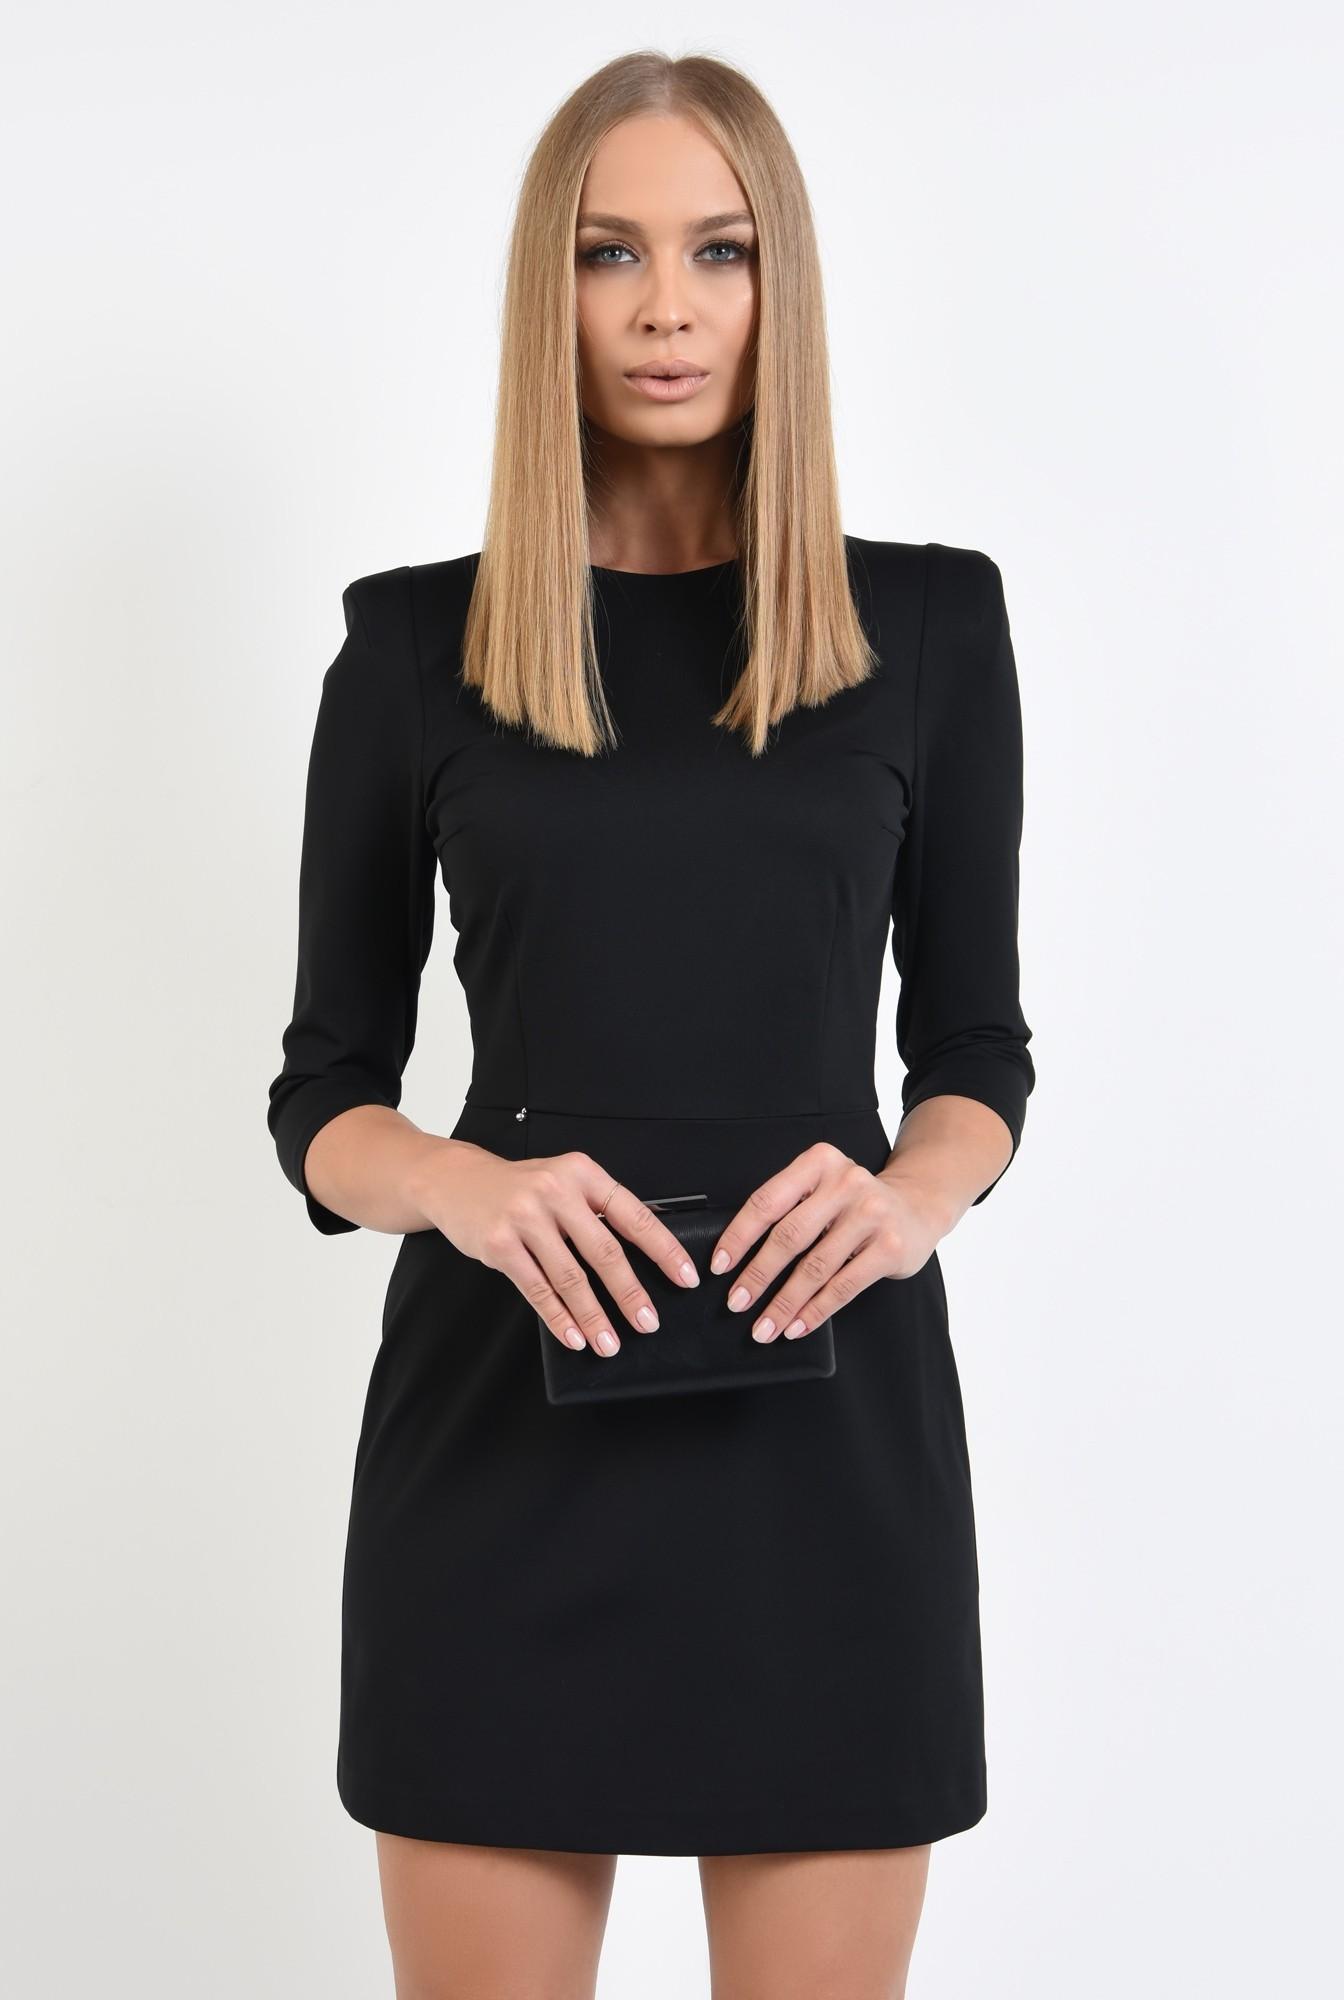 0 - 360 - rochie mini, neagra, maneci 3/4, croi usor evazat